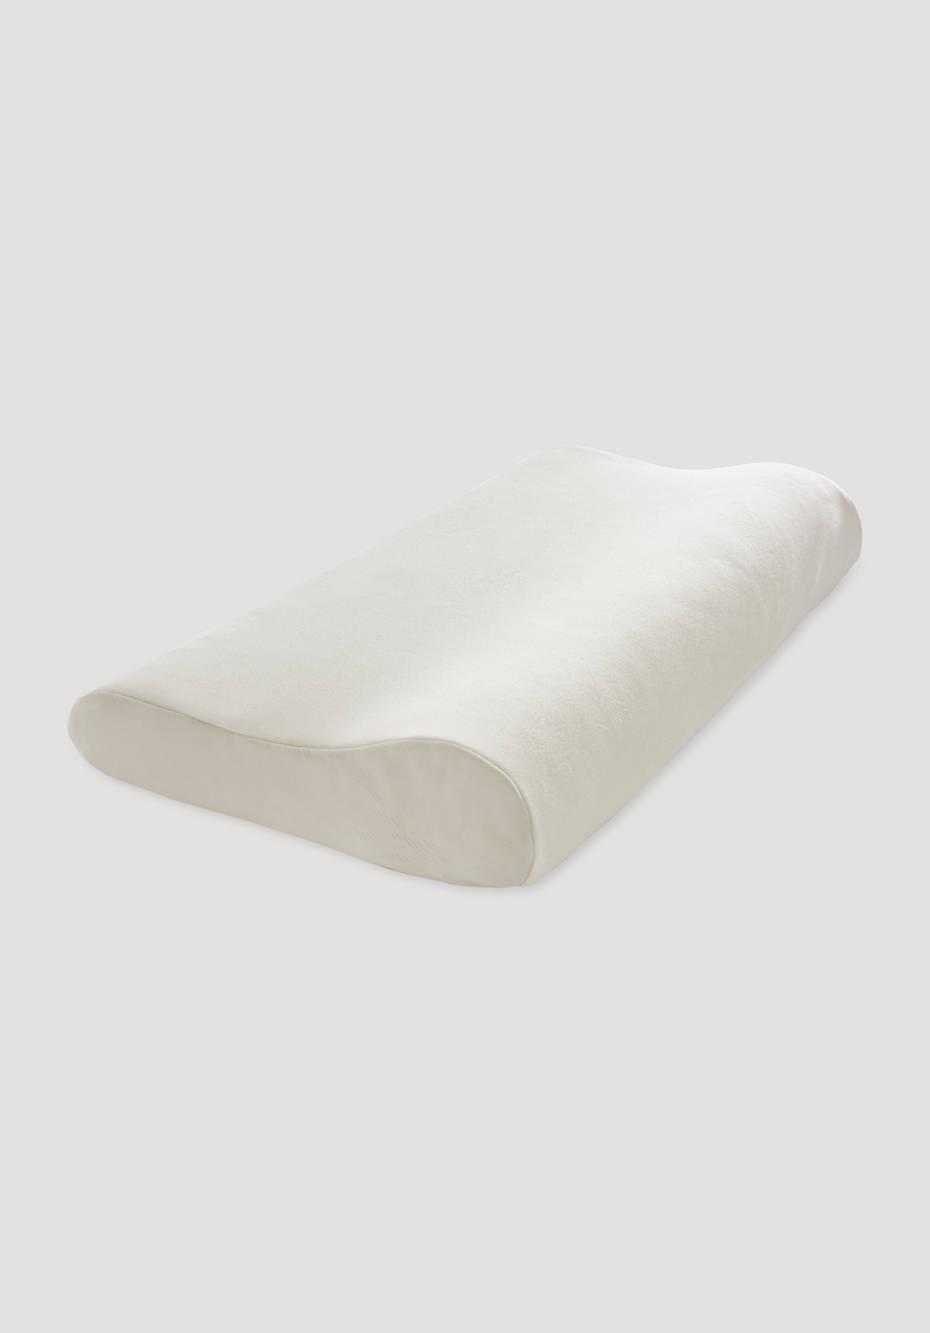 Neck support pillow RELAX